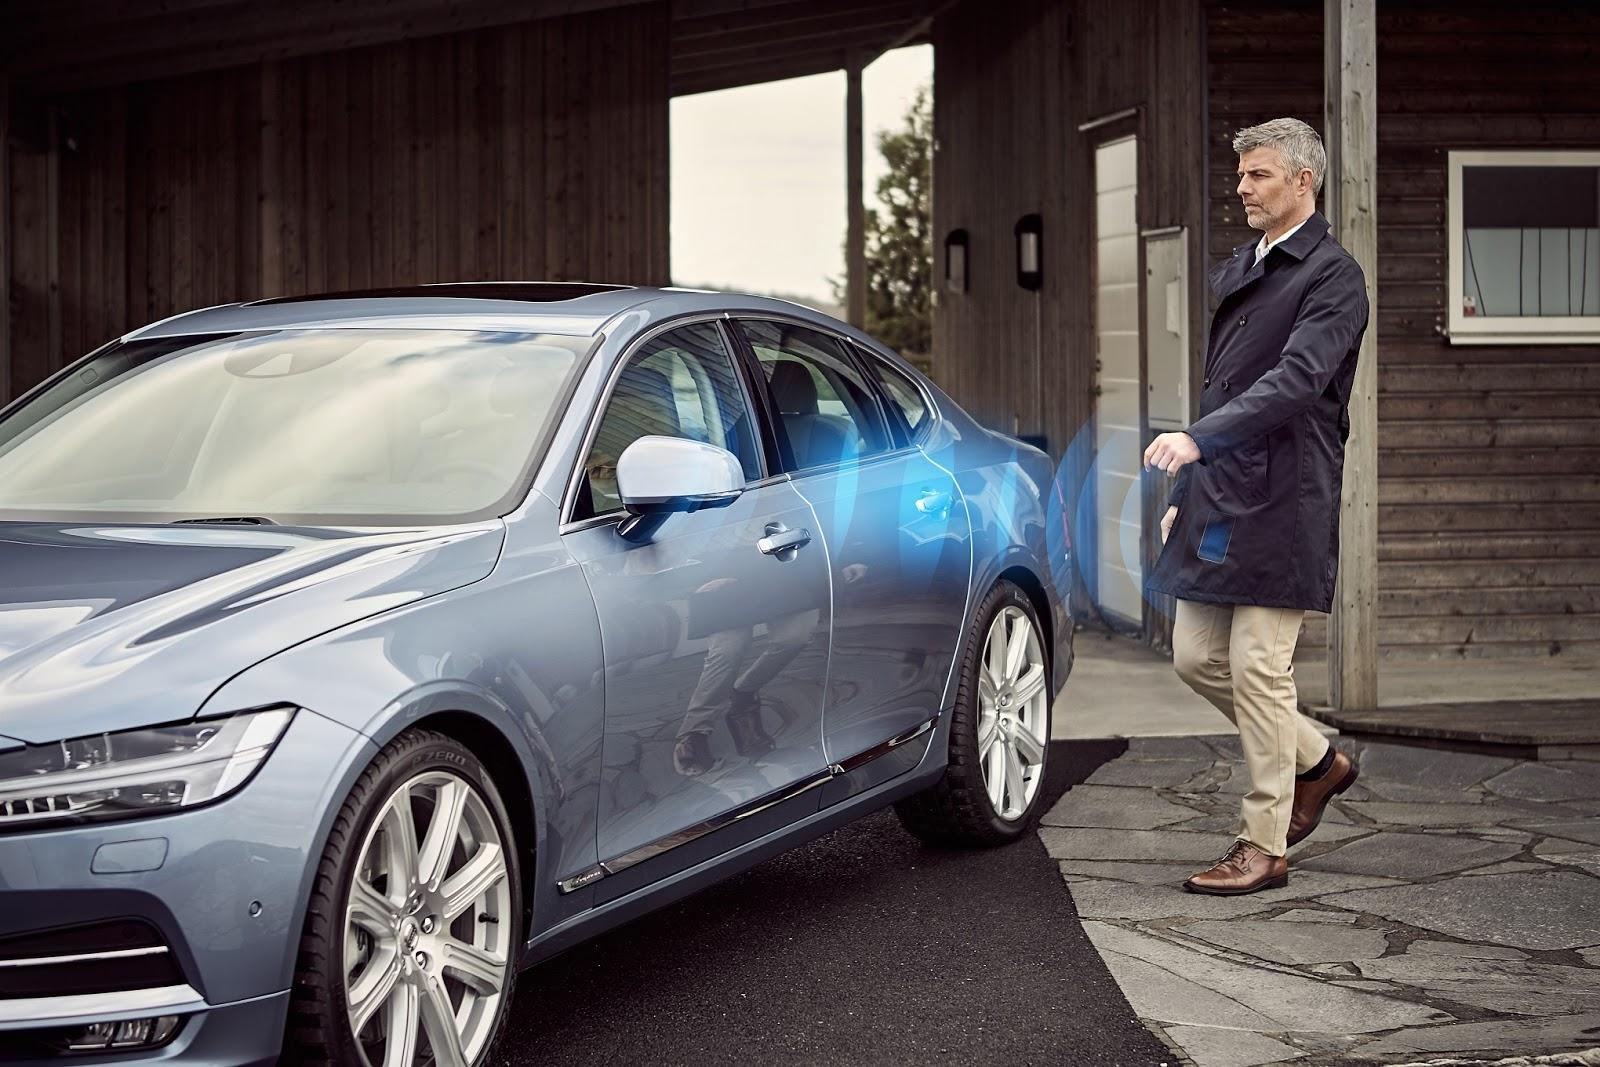 VOLVO%2BDIGITAL%2BCAR%2BKEY%2B1 Απο το 2017 η Volvo θα αντικαταστήσει το κλειδί με μια εφαρμογή στο κινητό